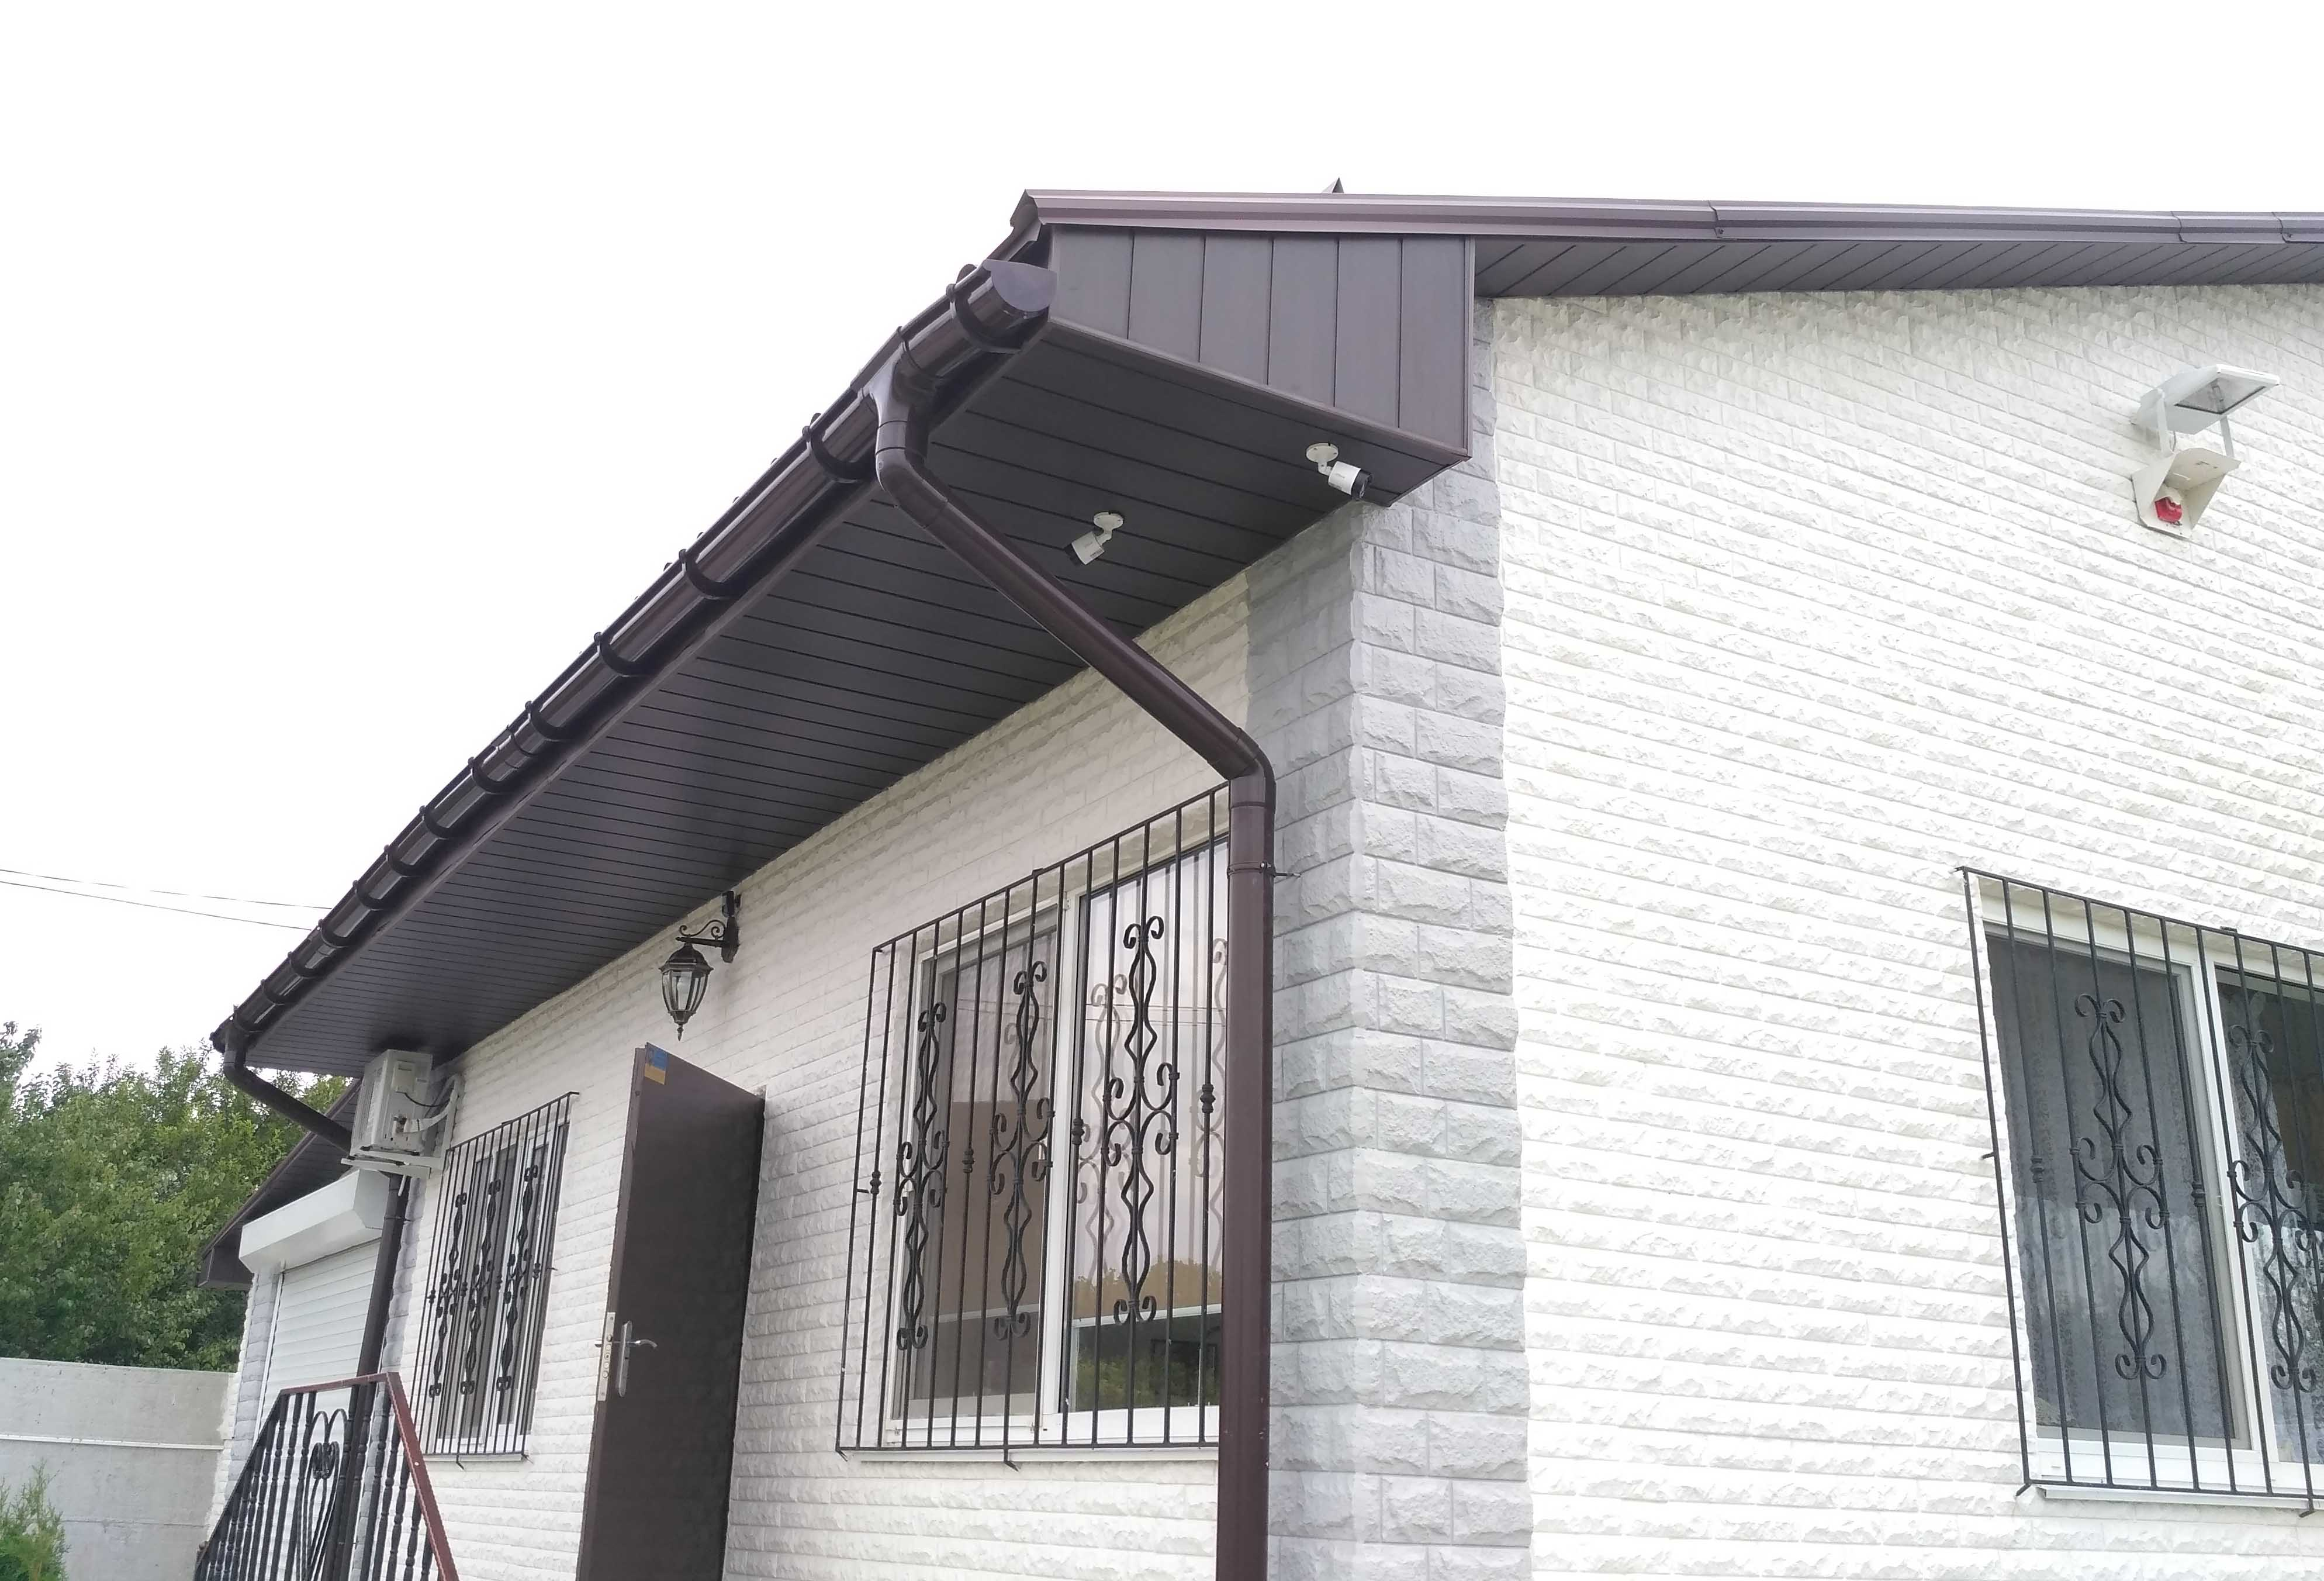 Установка видеонаблюдения в загородном доме, на даче